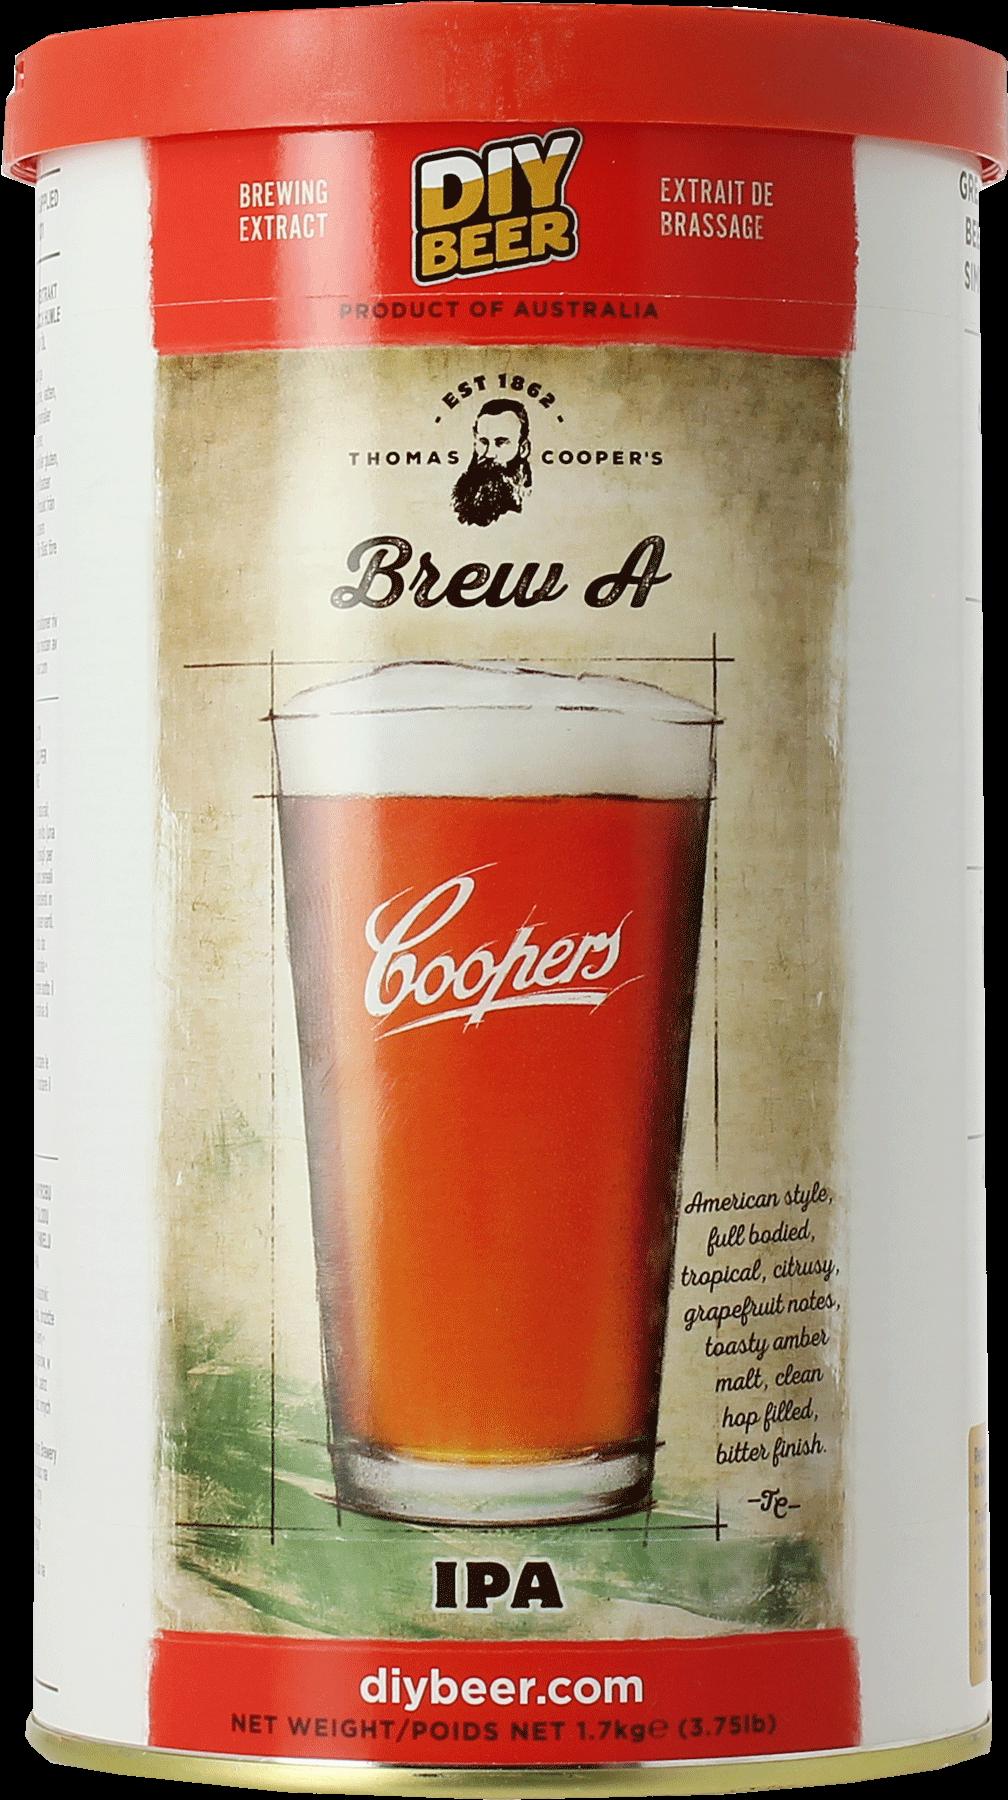 Kit à bière Coopers Brew A IPA 1,7kg